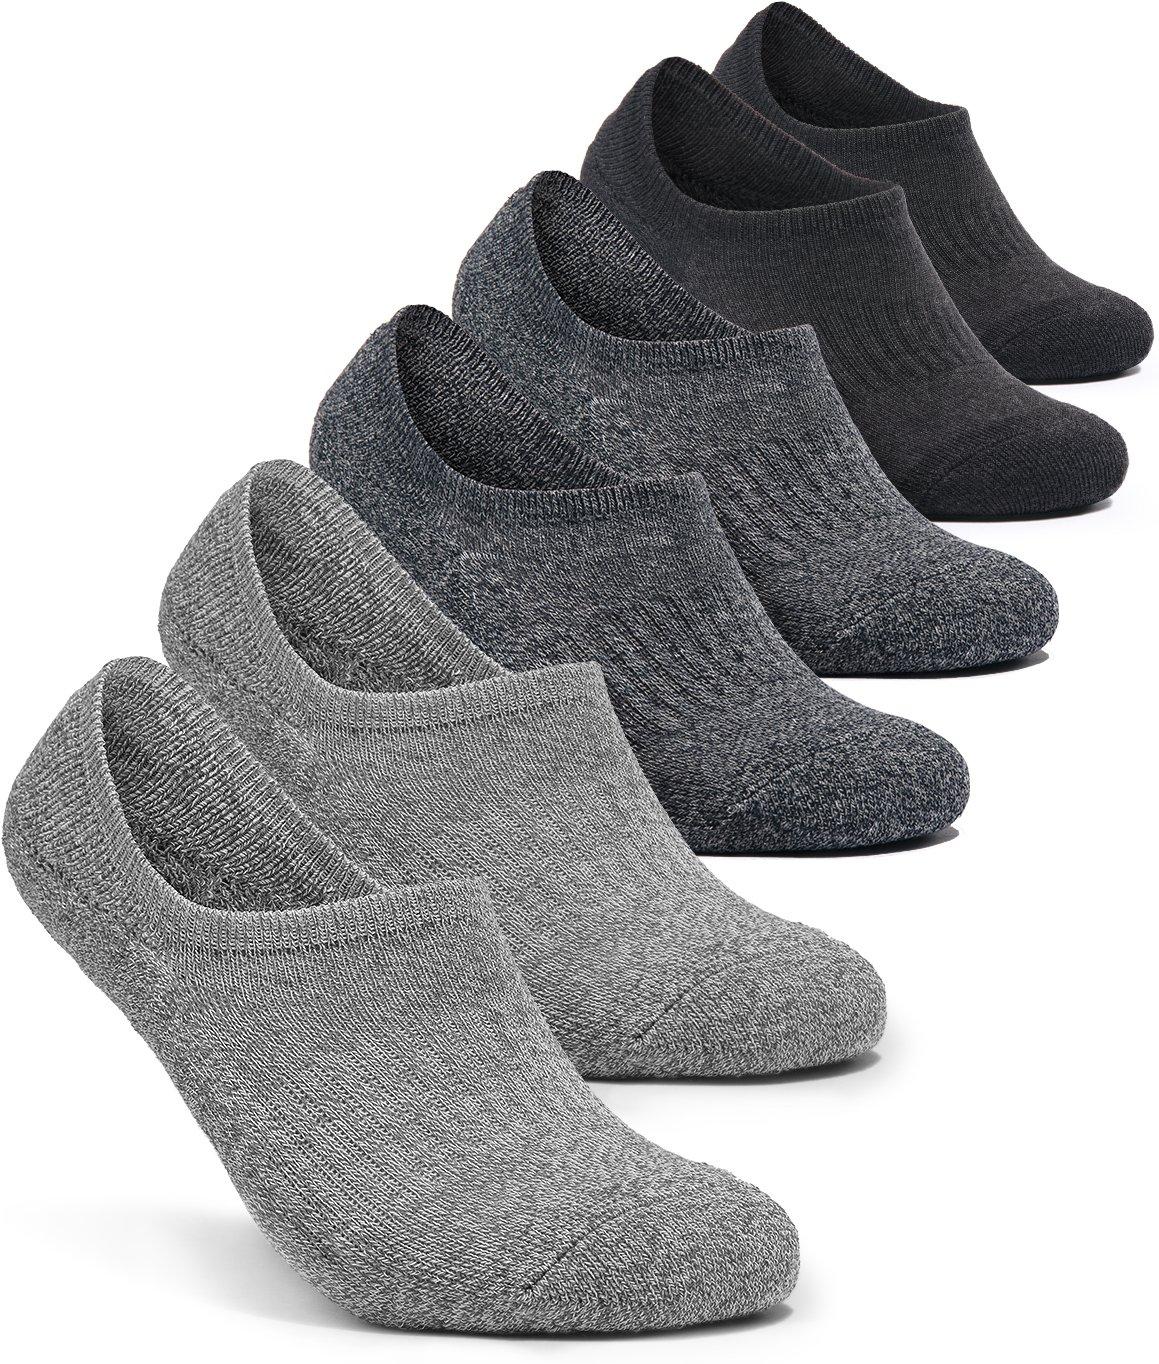 Tesla TM-MZS07-GDC_Medium 6-Pairs Unisex No-Show Casual Fashion Socks w Heel Silicone Grips MZS07 by Tesla